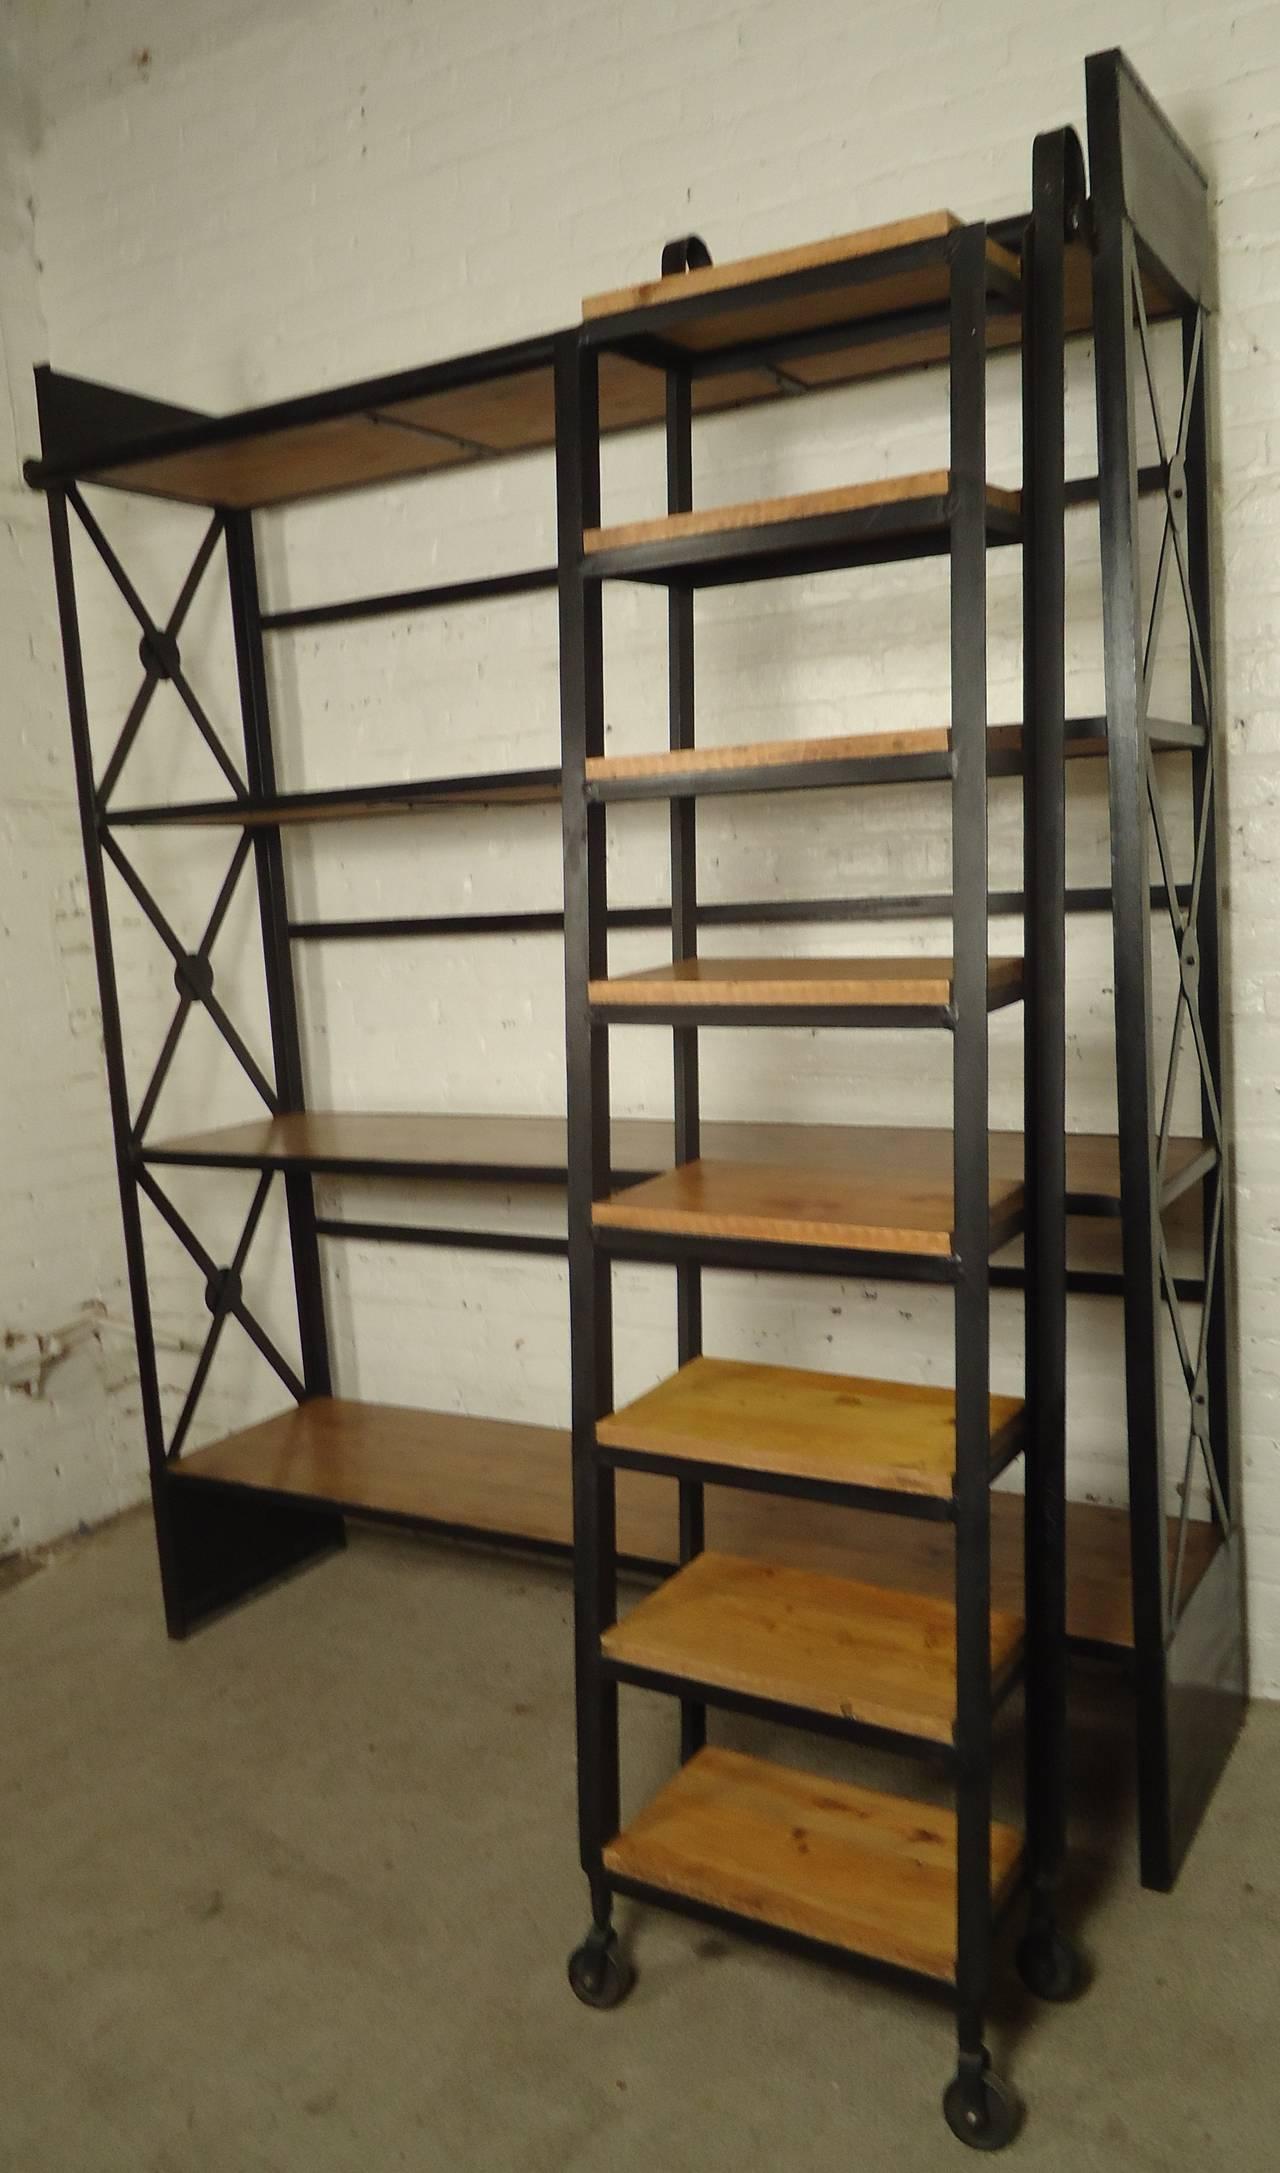 Where to buy wood shelves 28 images where to buy - Esszimmer bad nauheim ...